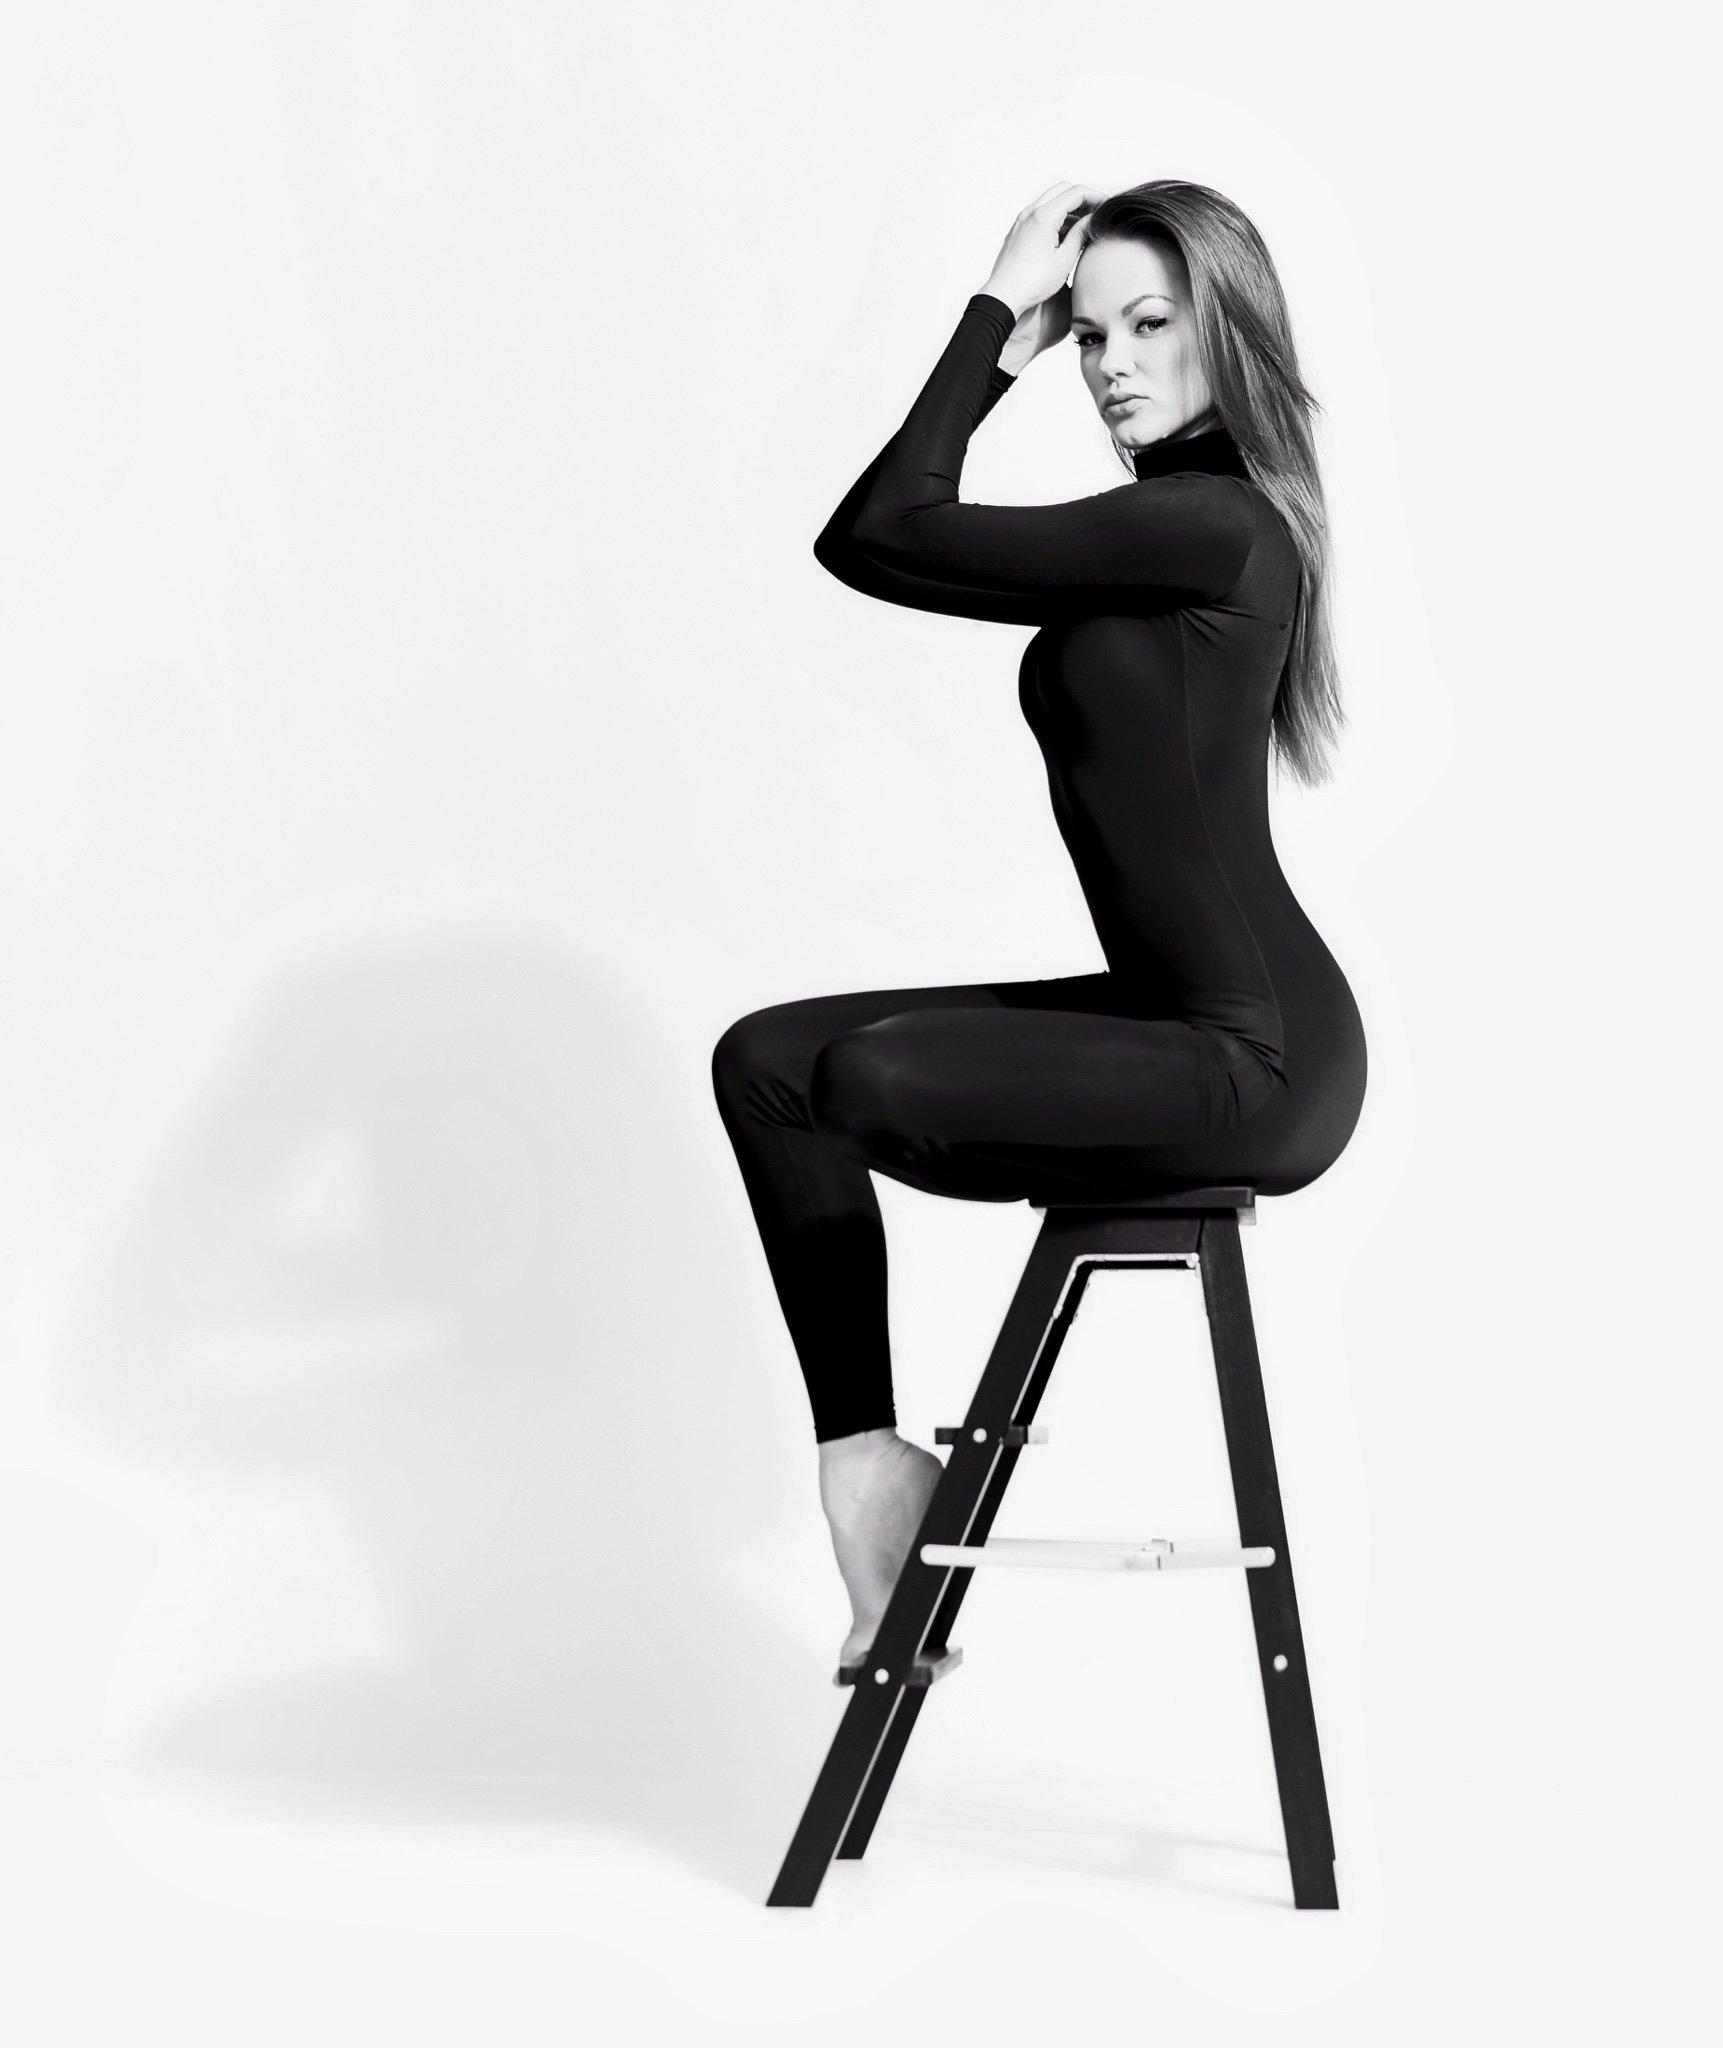 PROTACT ONE - Pro Fitness (under)wear - Ballet Heels® by